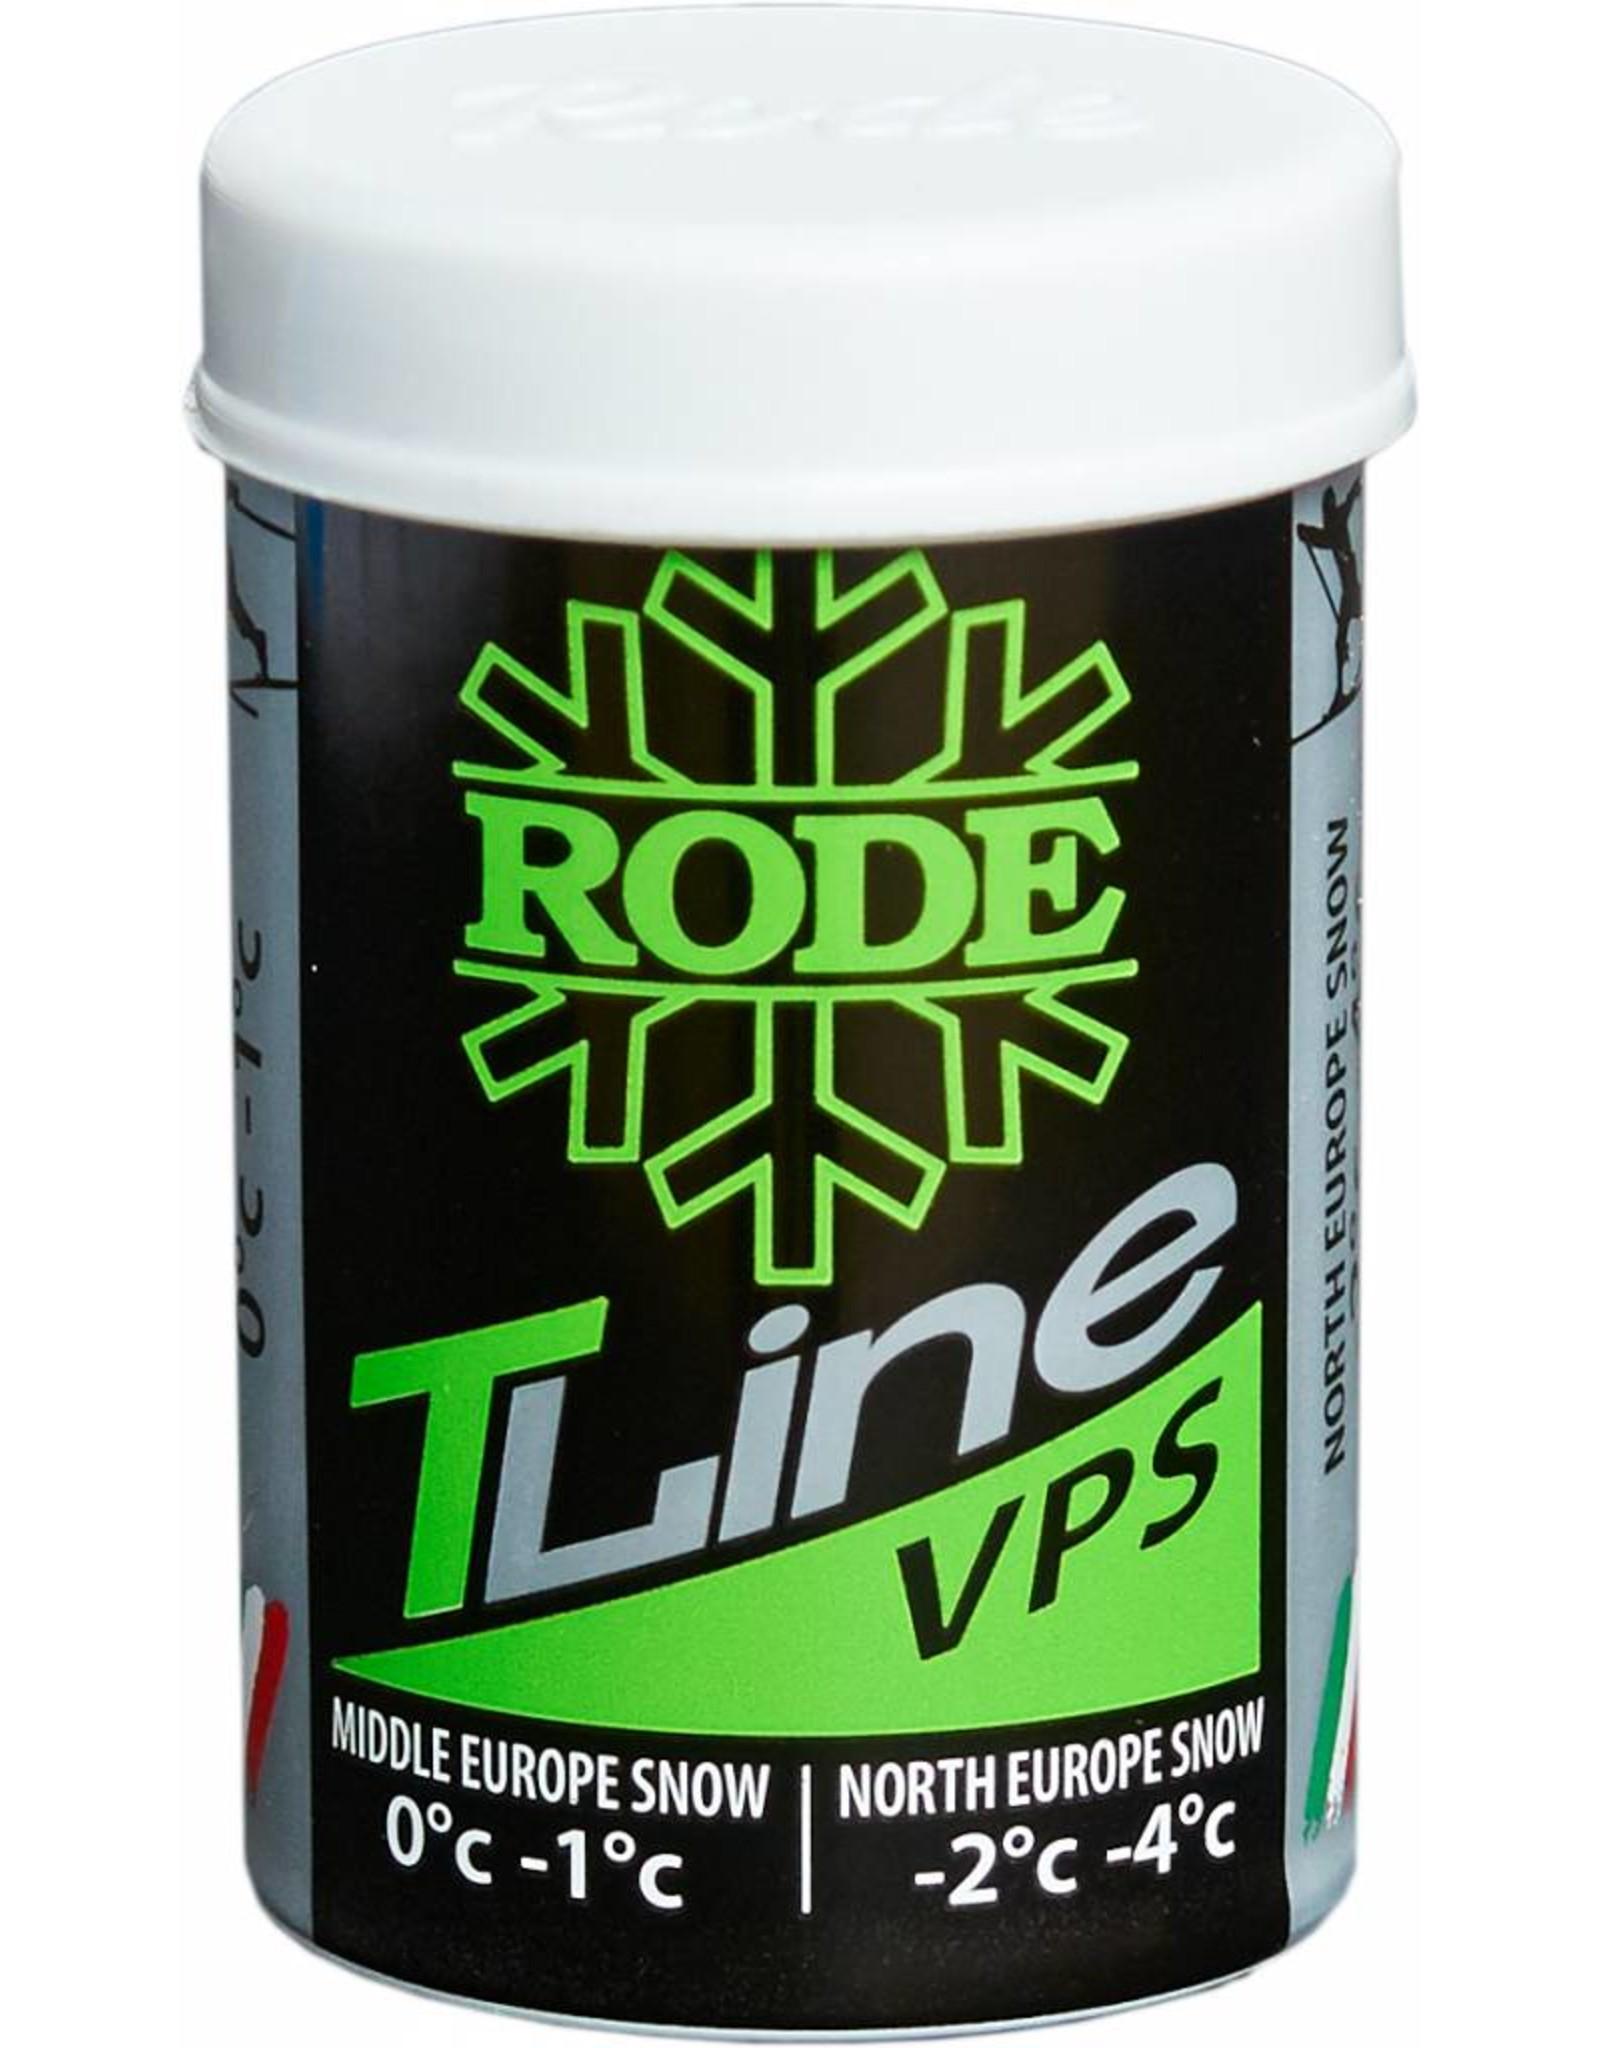 Rode Top Line VPS 45g